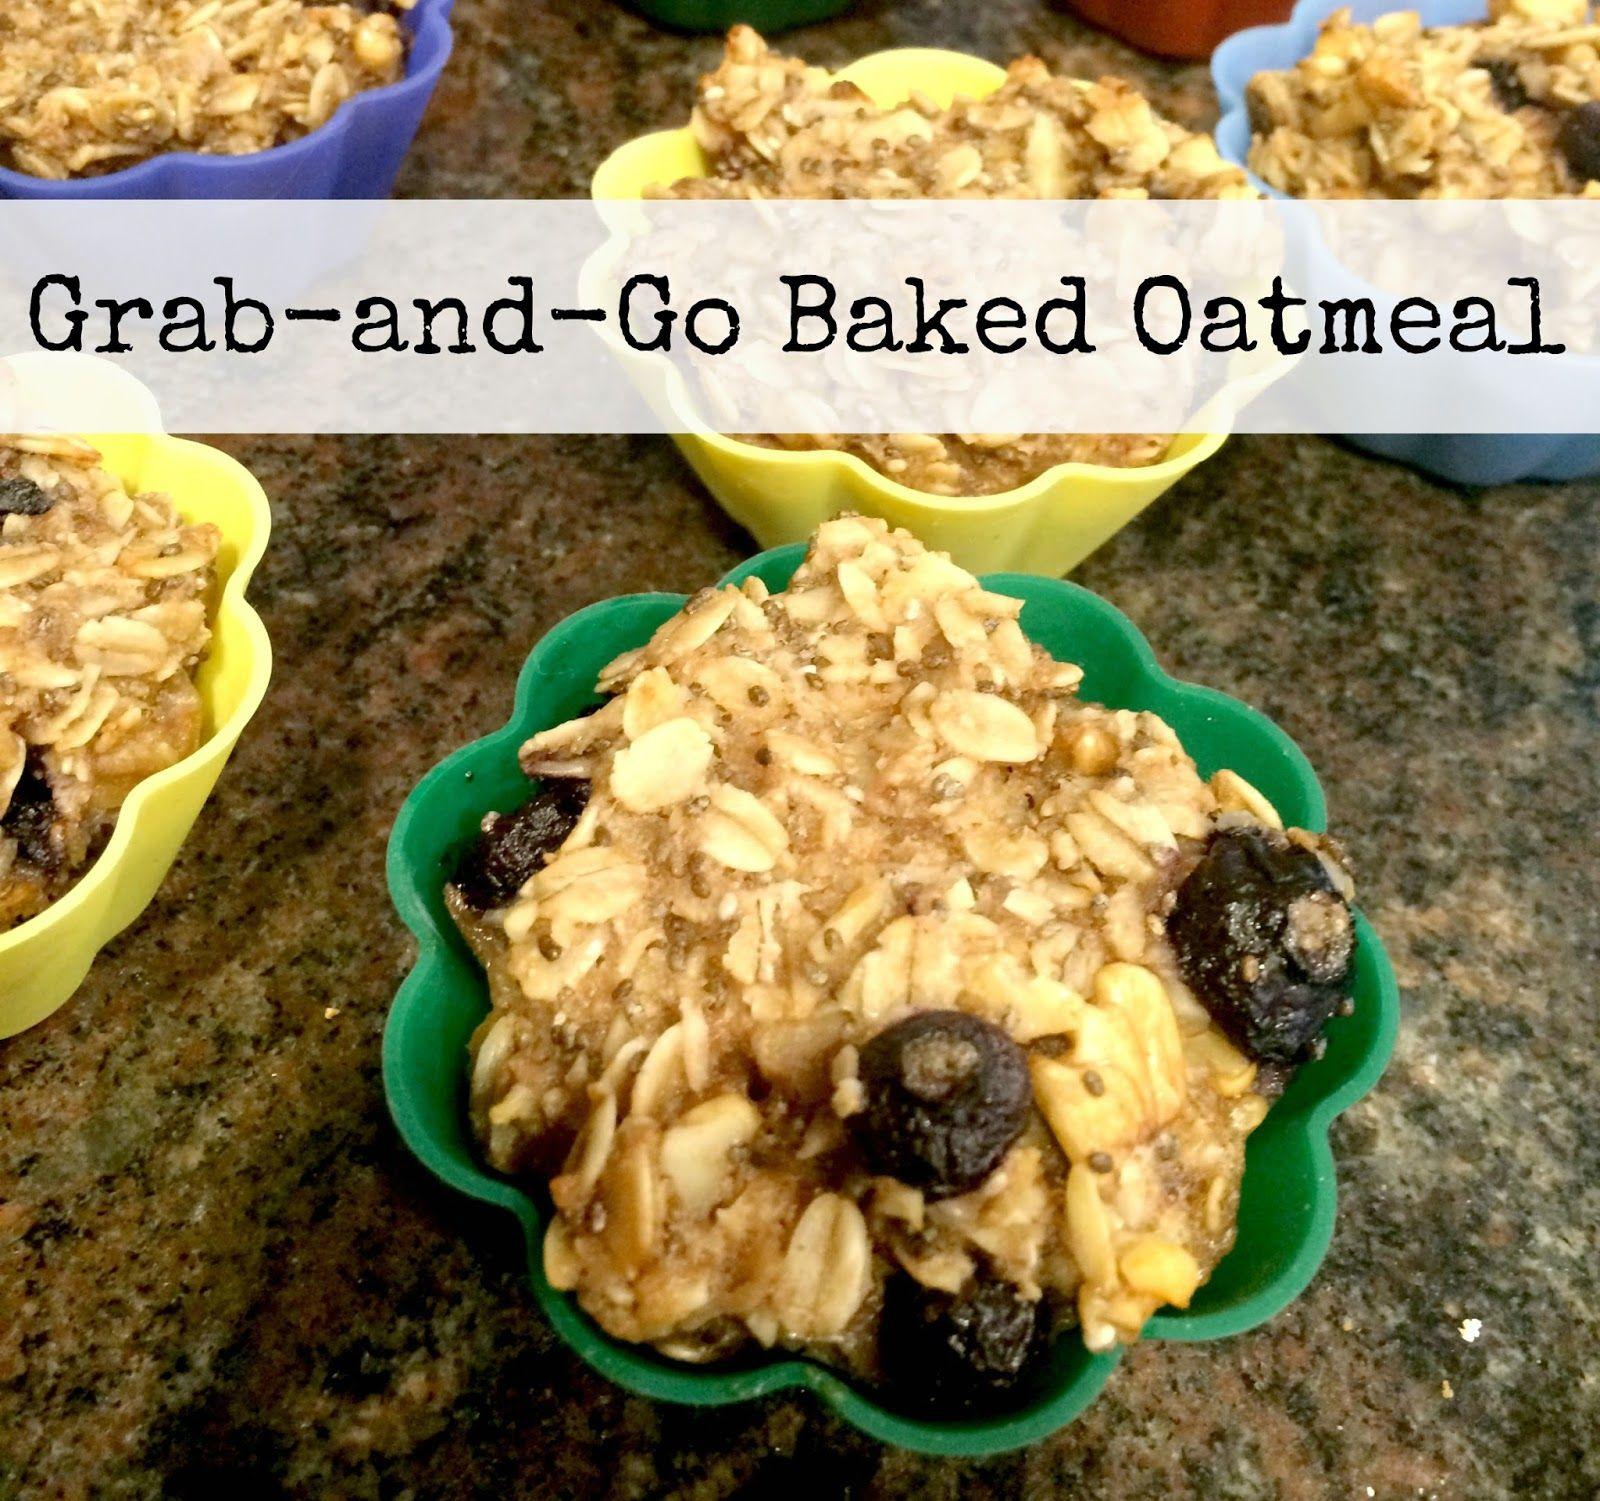 Little Bits of Joy: Put Down that Pop Tart!! Make These Instead!